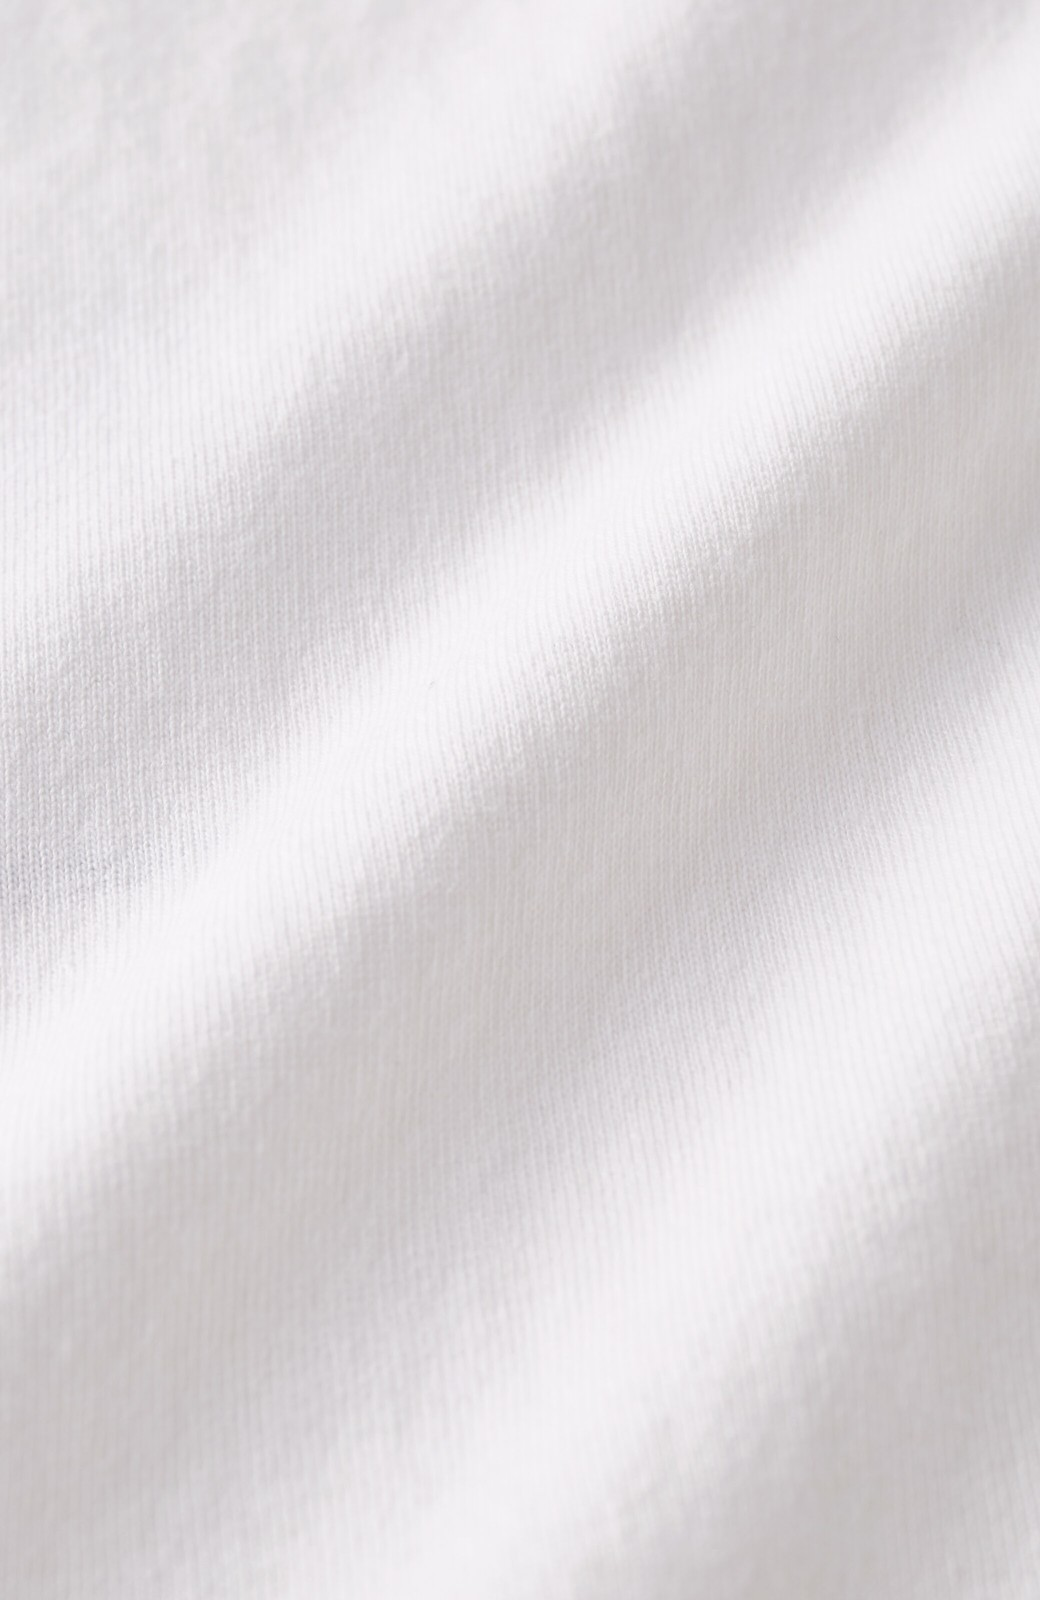 haco! 女の子バンザイ!プロジェクト【毎日いろいろあるのよ】PBPオーガニックコットンの女子の気持ちを察してほしいよTシャツ <ホワイト>の商品写真3